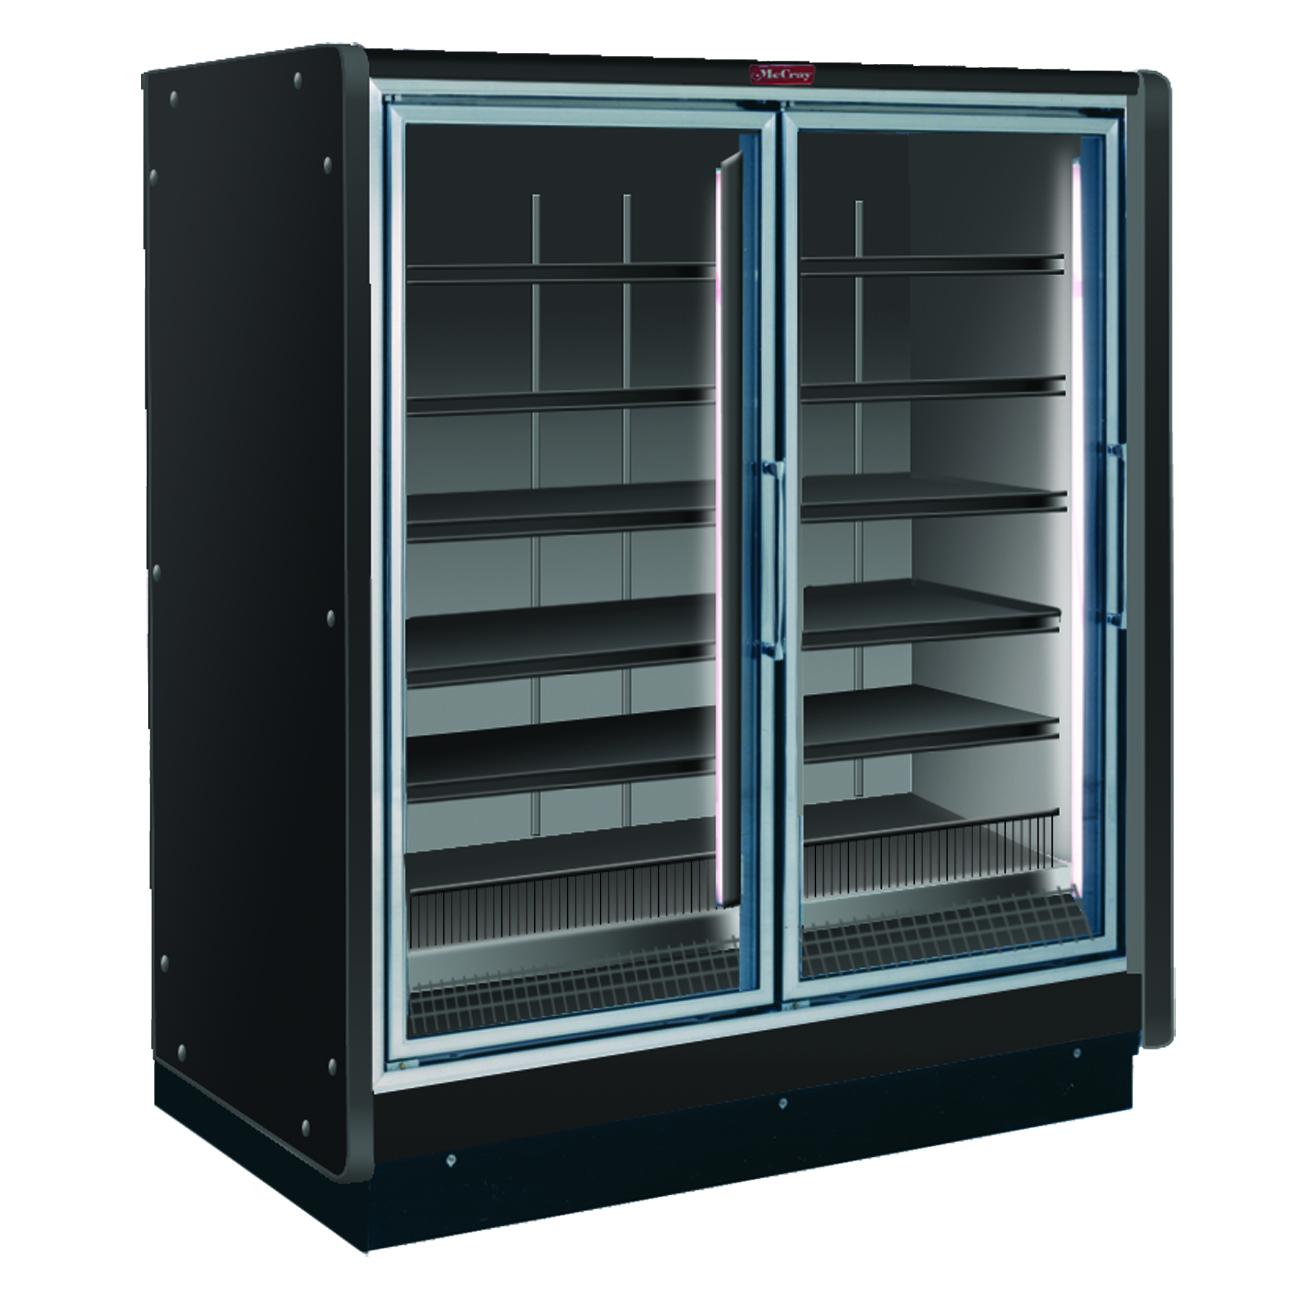 Howard-McCray RIN2-24-LED-B refrigerator, merchandiser